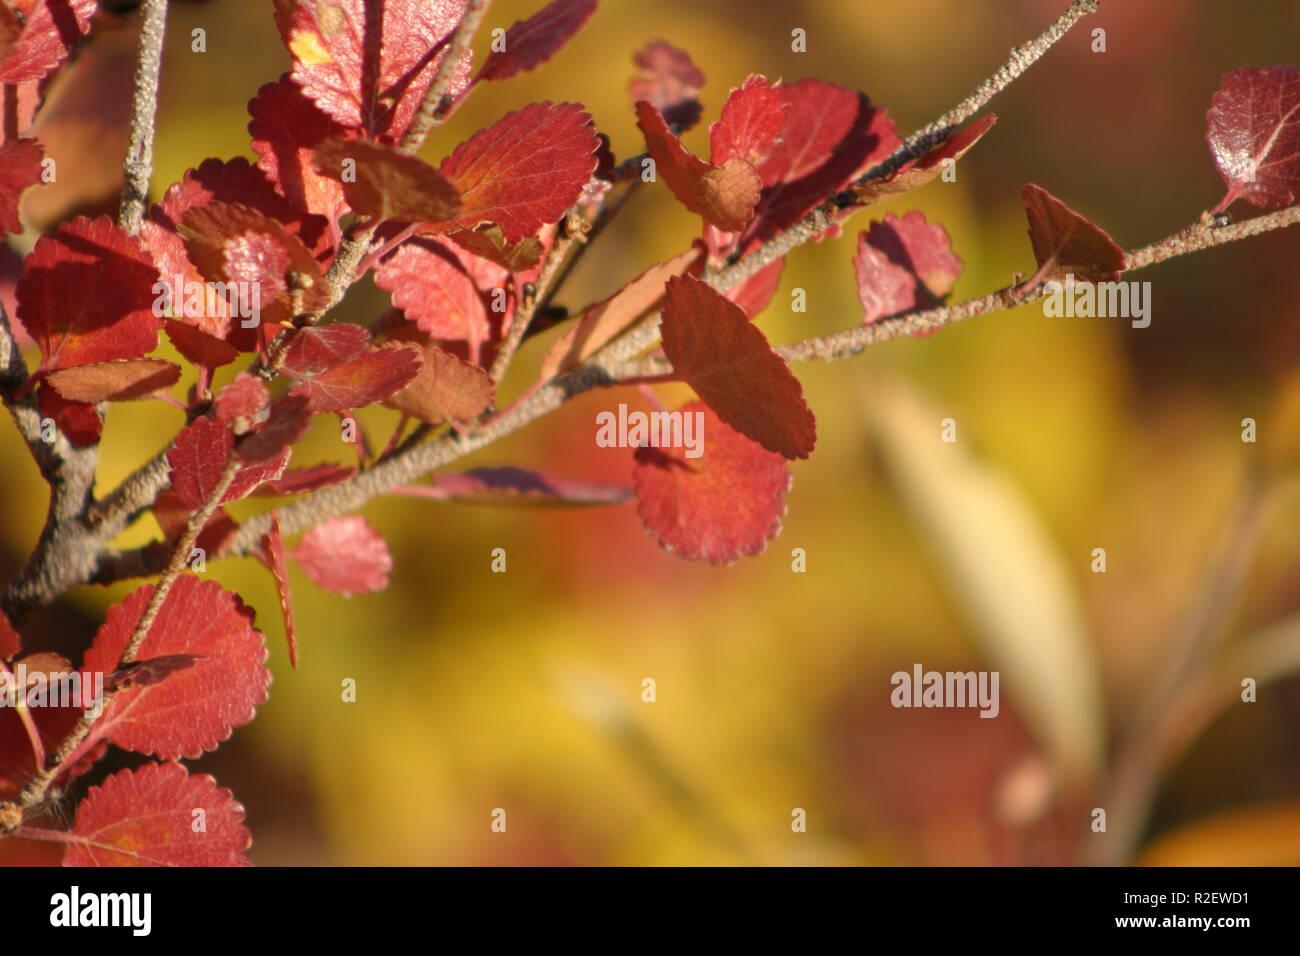 autumn colors in eagle plains yukon - Stock Image